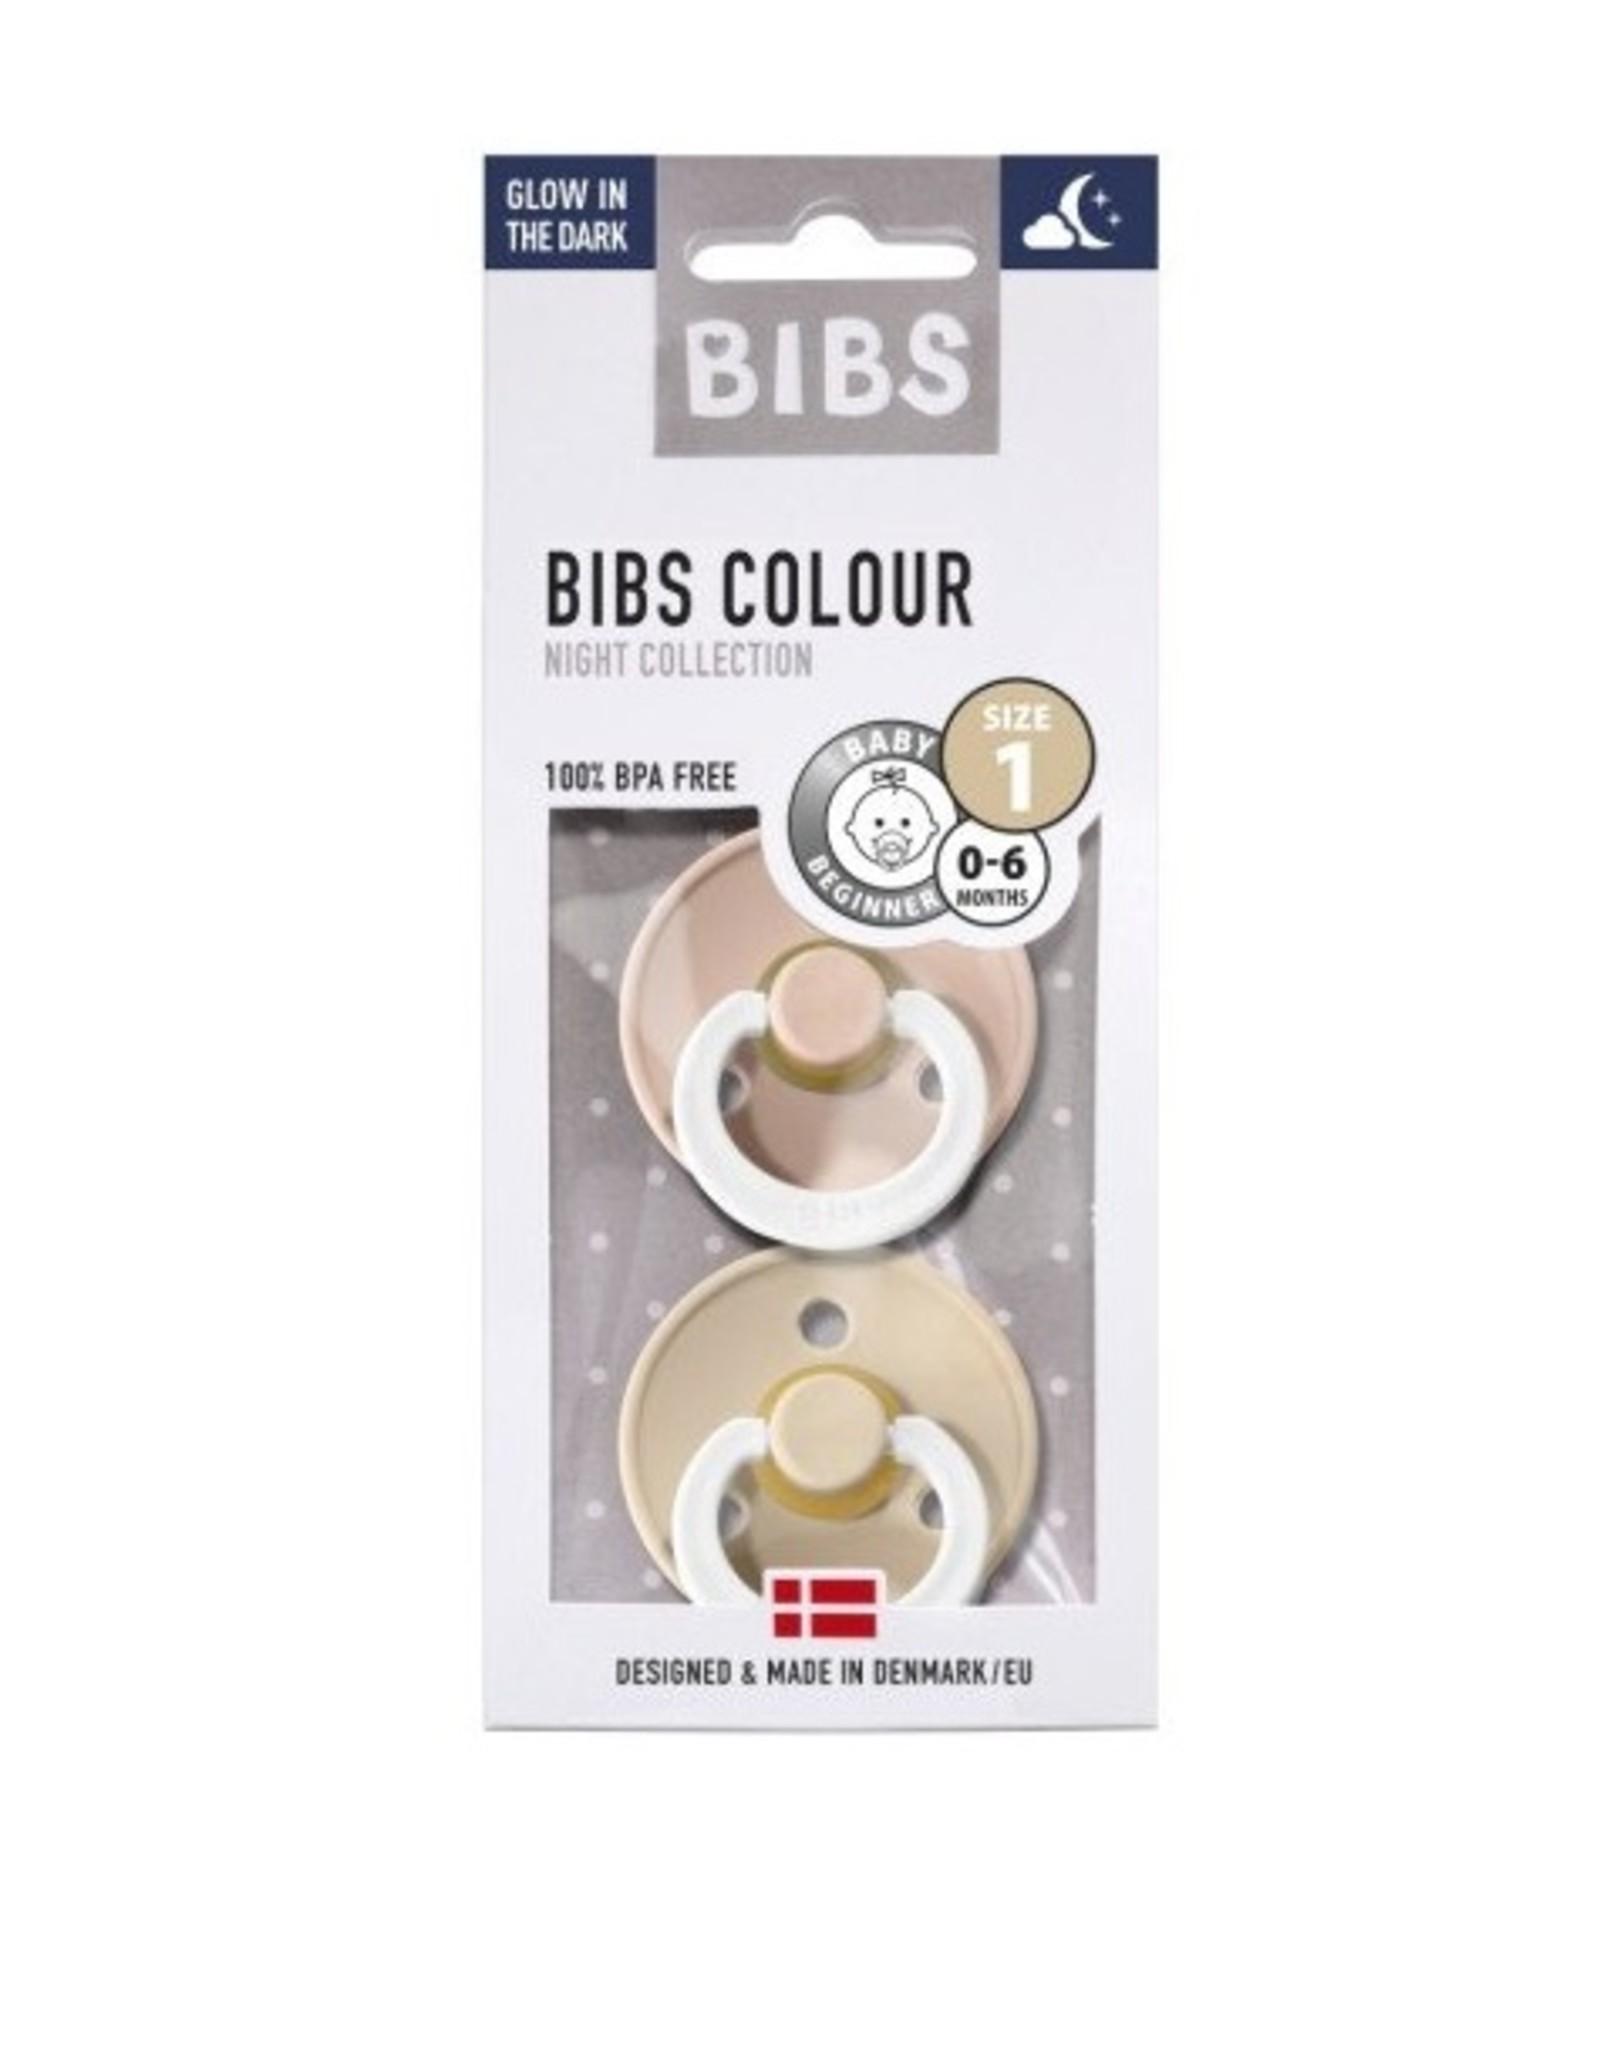 Bibs Bibs Fopspenen glow in the dark  Vanilla/Blush